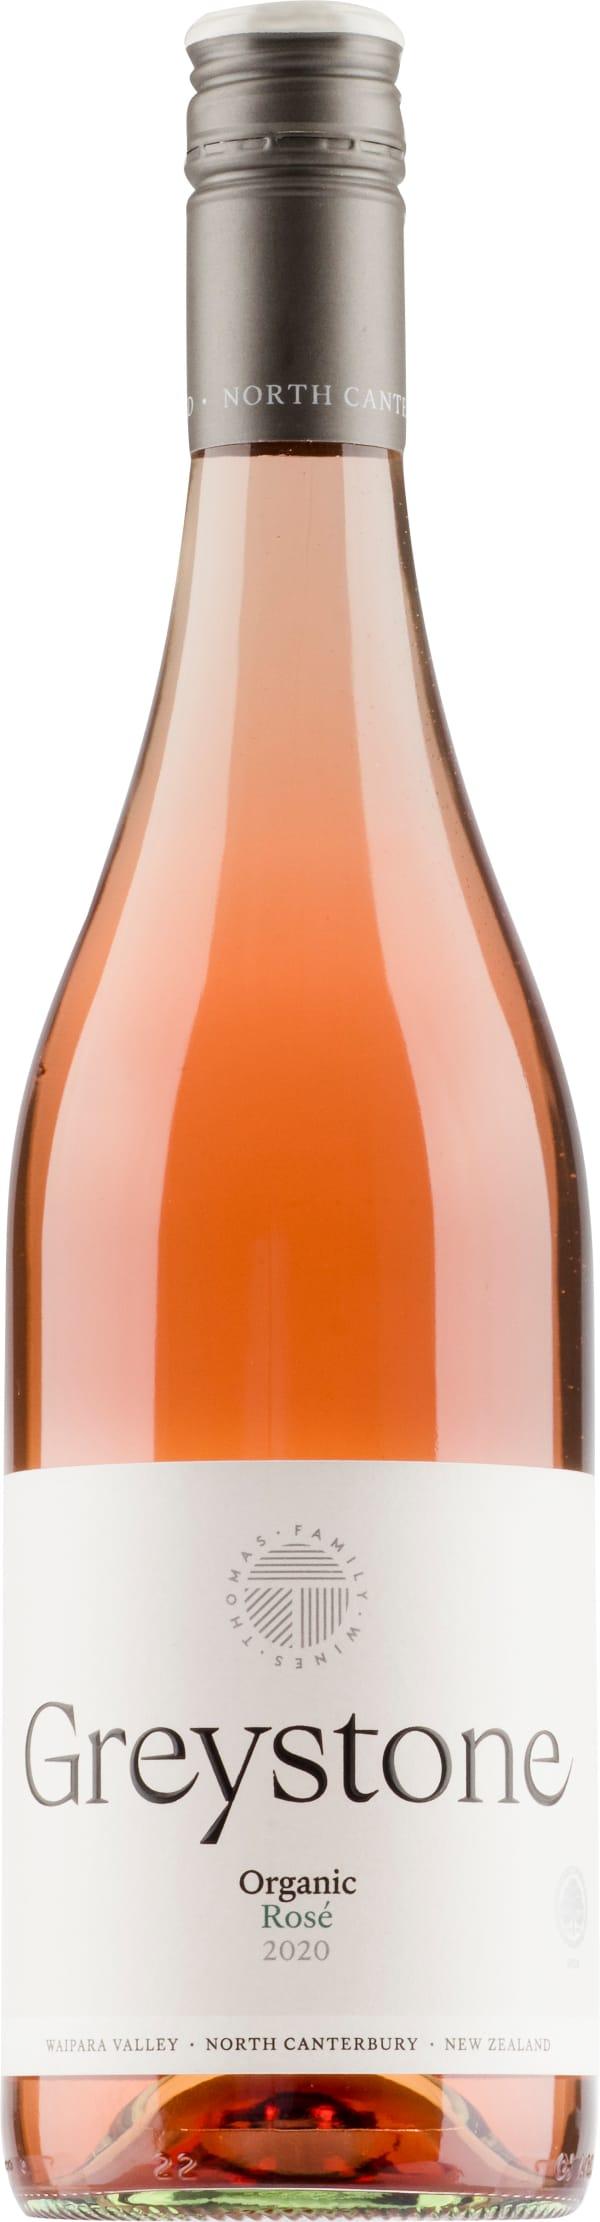 Greystone Organic Pinot Noir Rose 2020